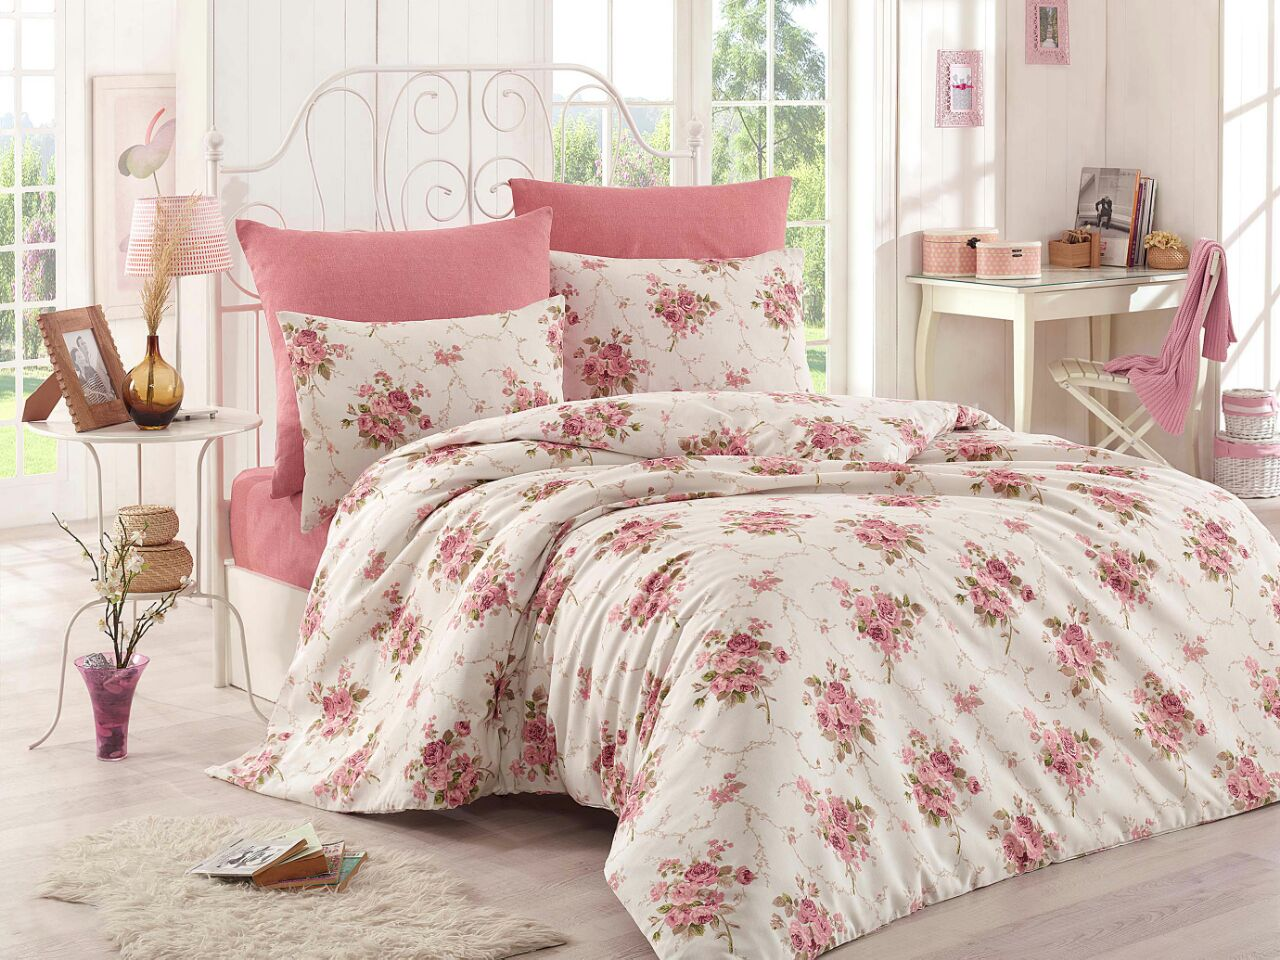 tlg bettw sche bettgarnitur 135 x 200 200 x 220 model rosen pink. Black Bedroom Furniture Sets. Home Design Ideas